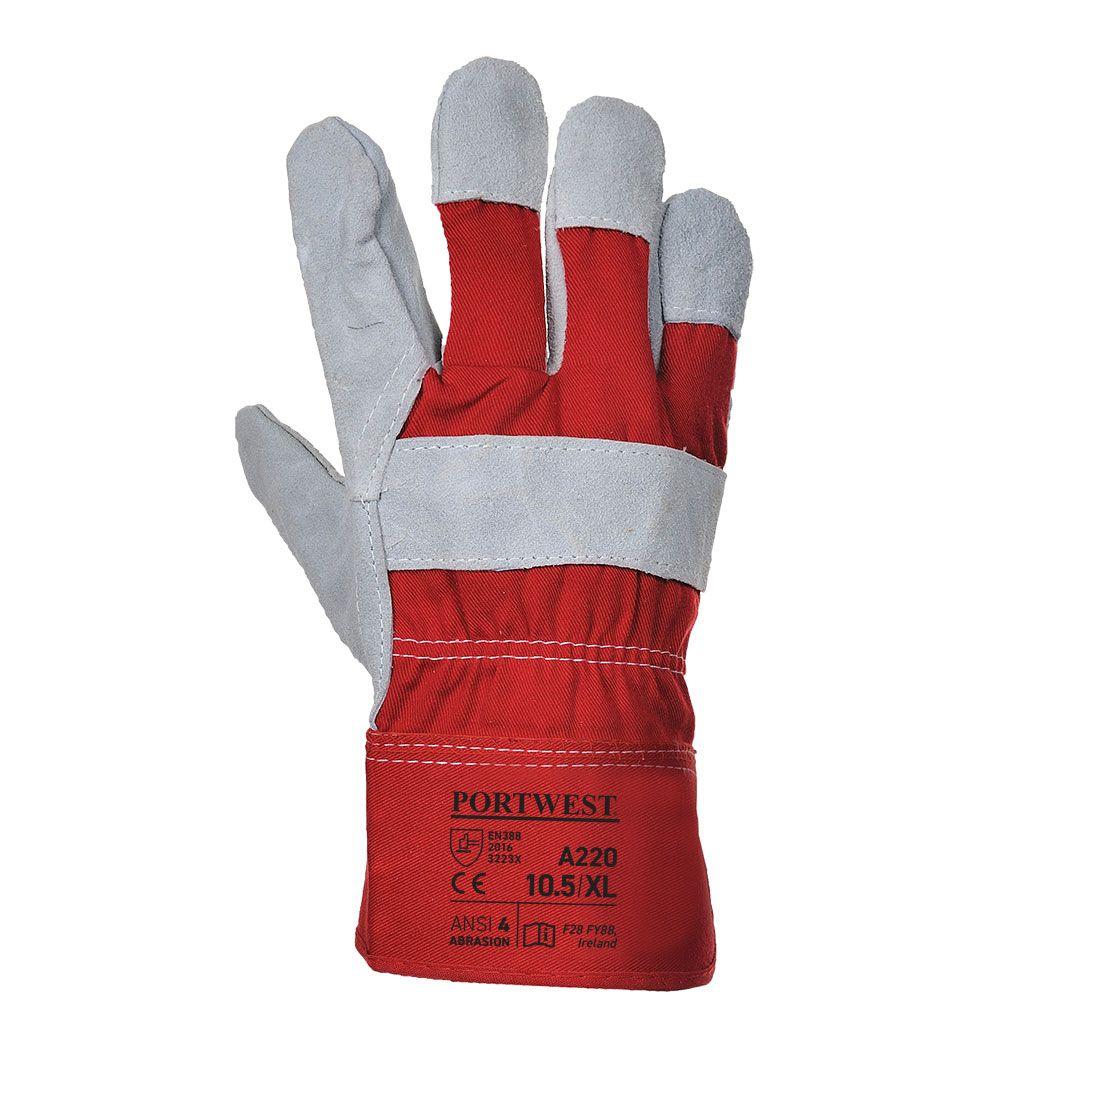 Portwest Handschoenen A220 rood(RE)